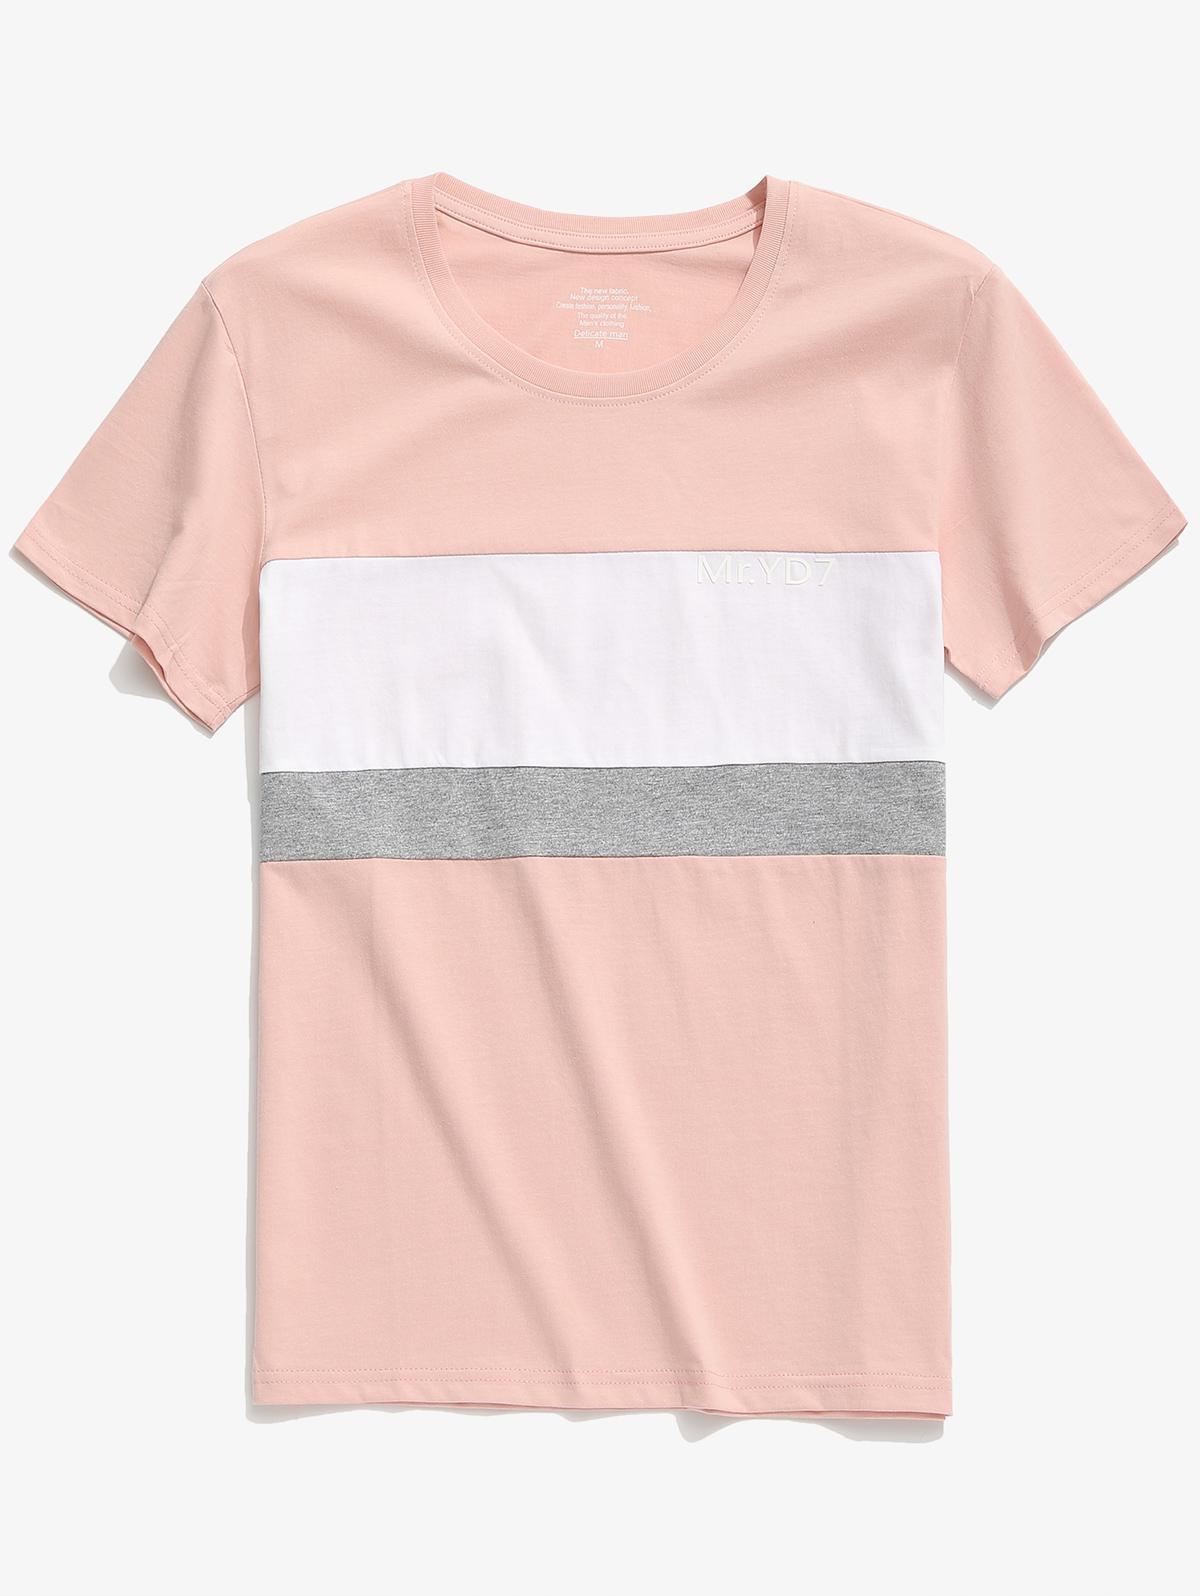 Letters Print Color Block Casual T-shirt, Multi-b